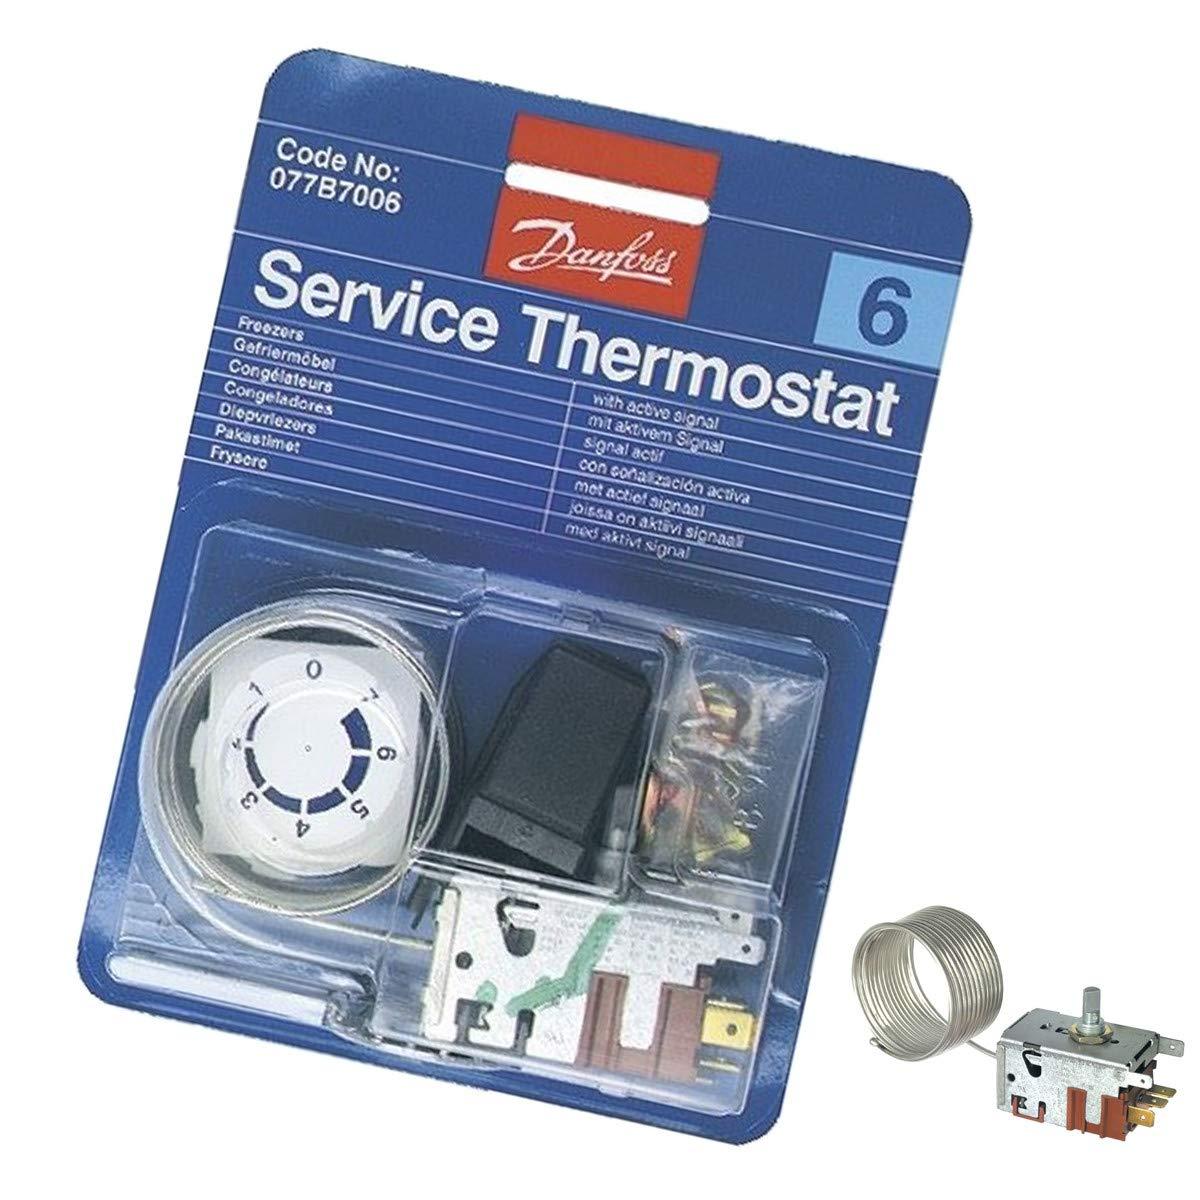 Termostato Danfoss N° 6 - 077B7006; referencia:AS0003932; para ...